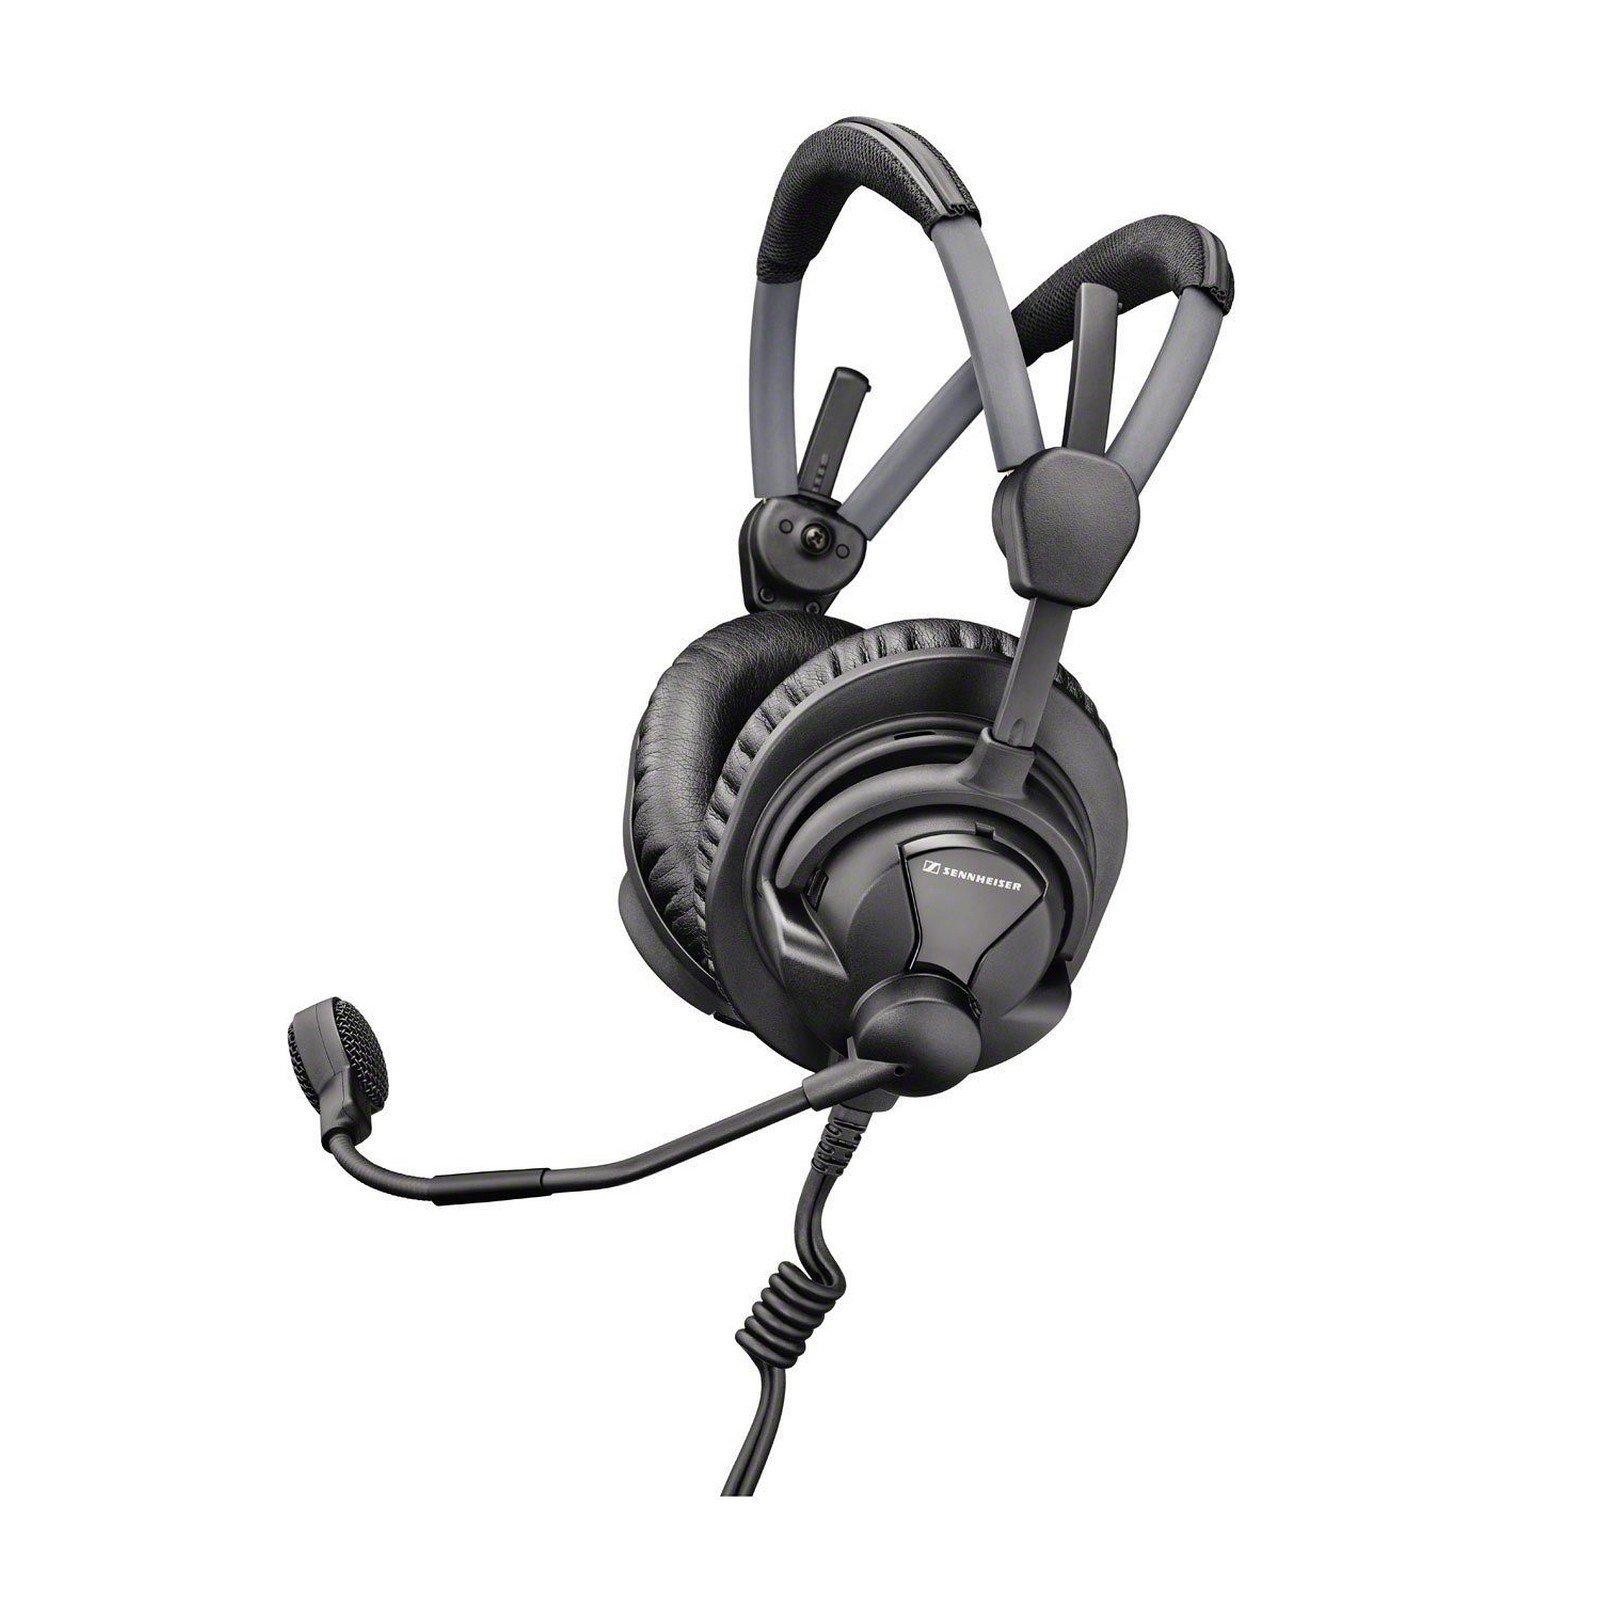 Sennheiser HMD 27   Professional Broadcast Headset Microphone for Commentators